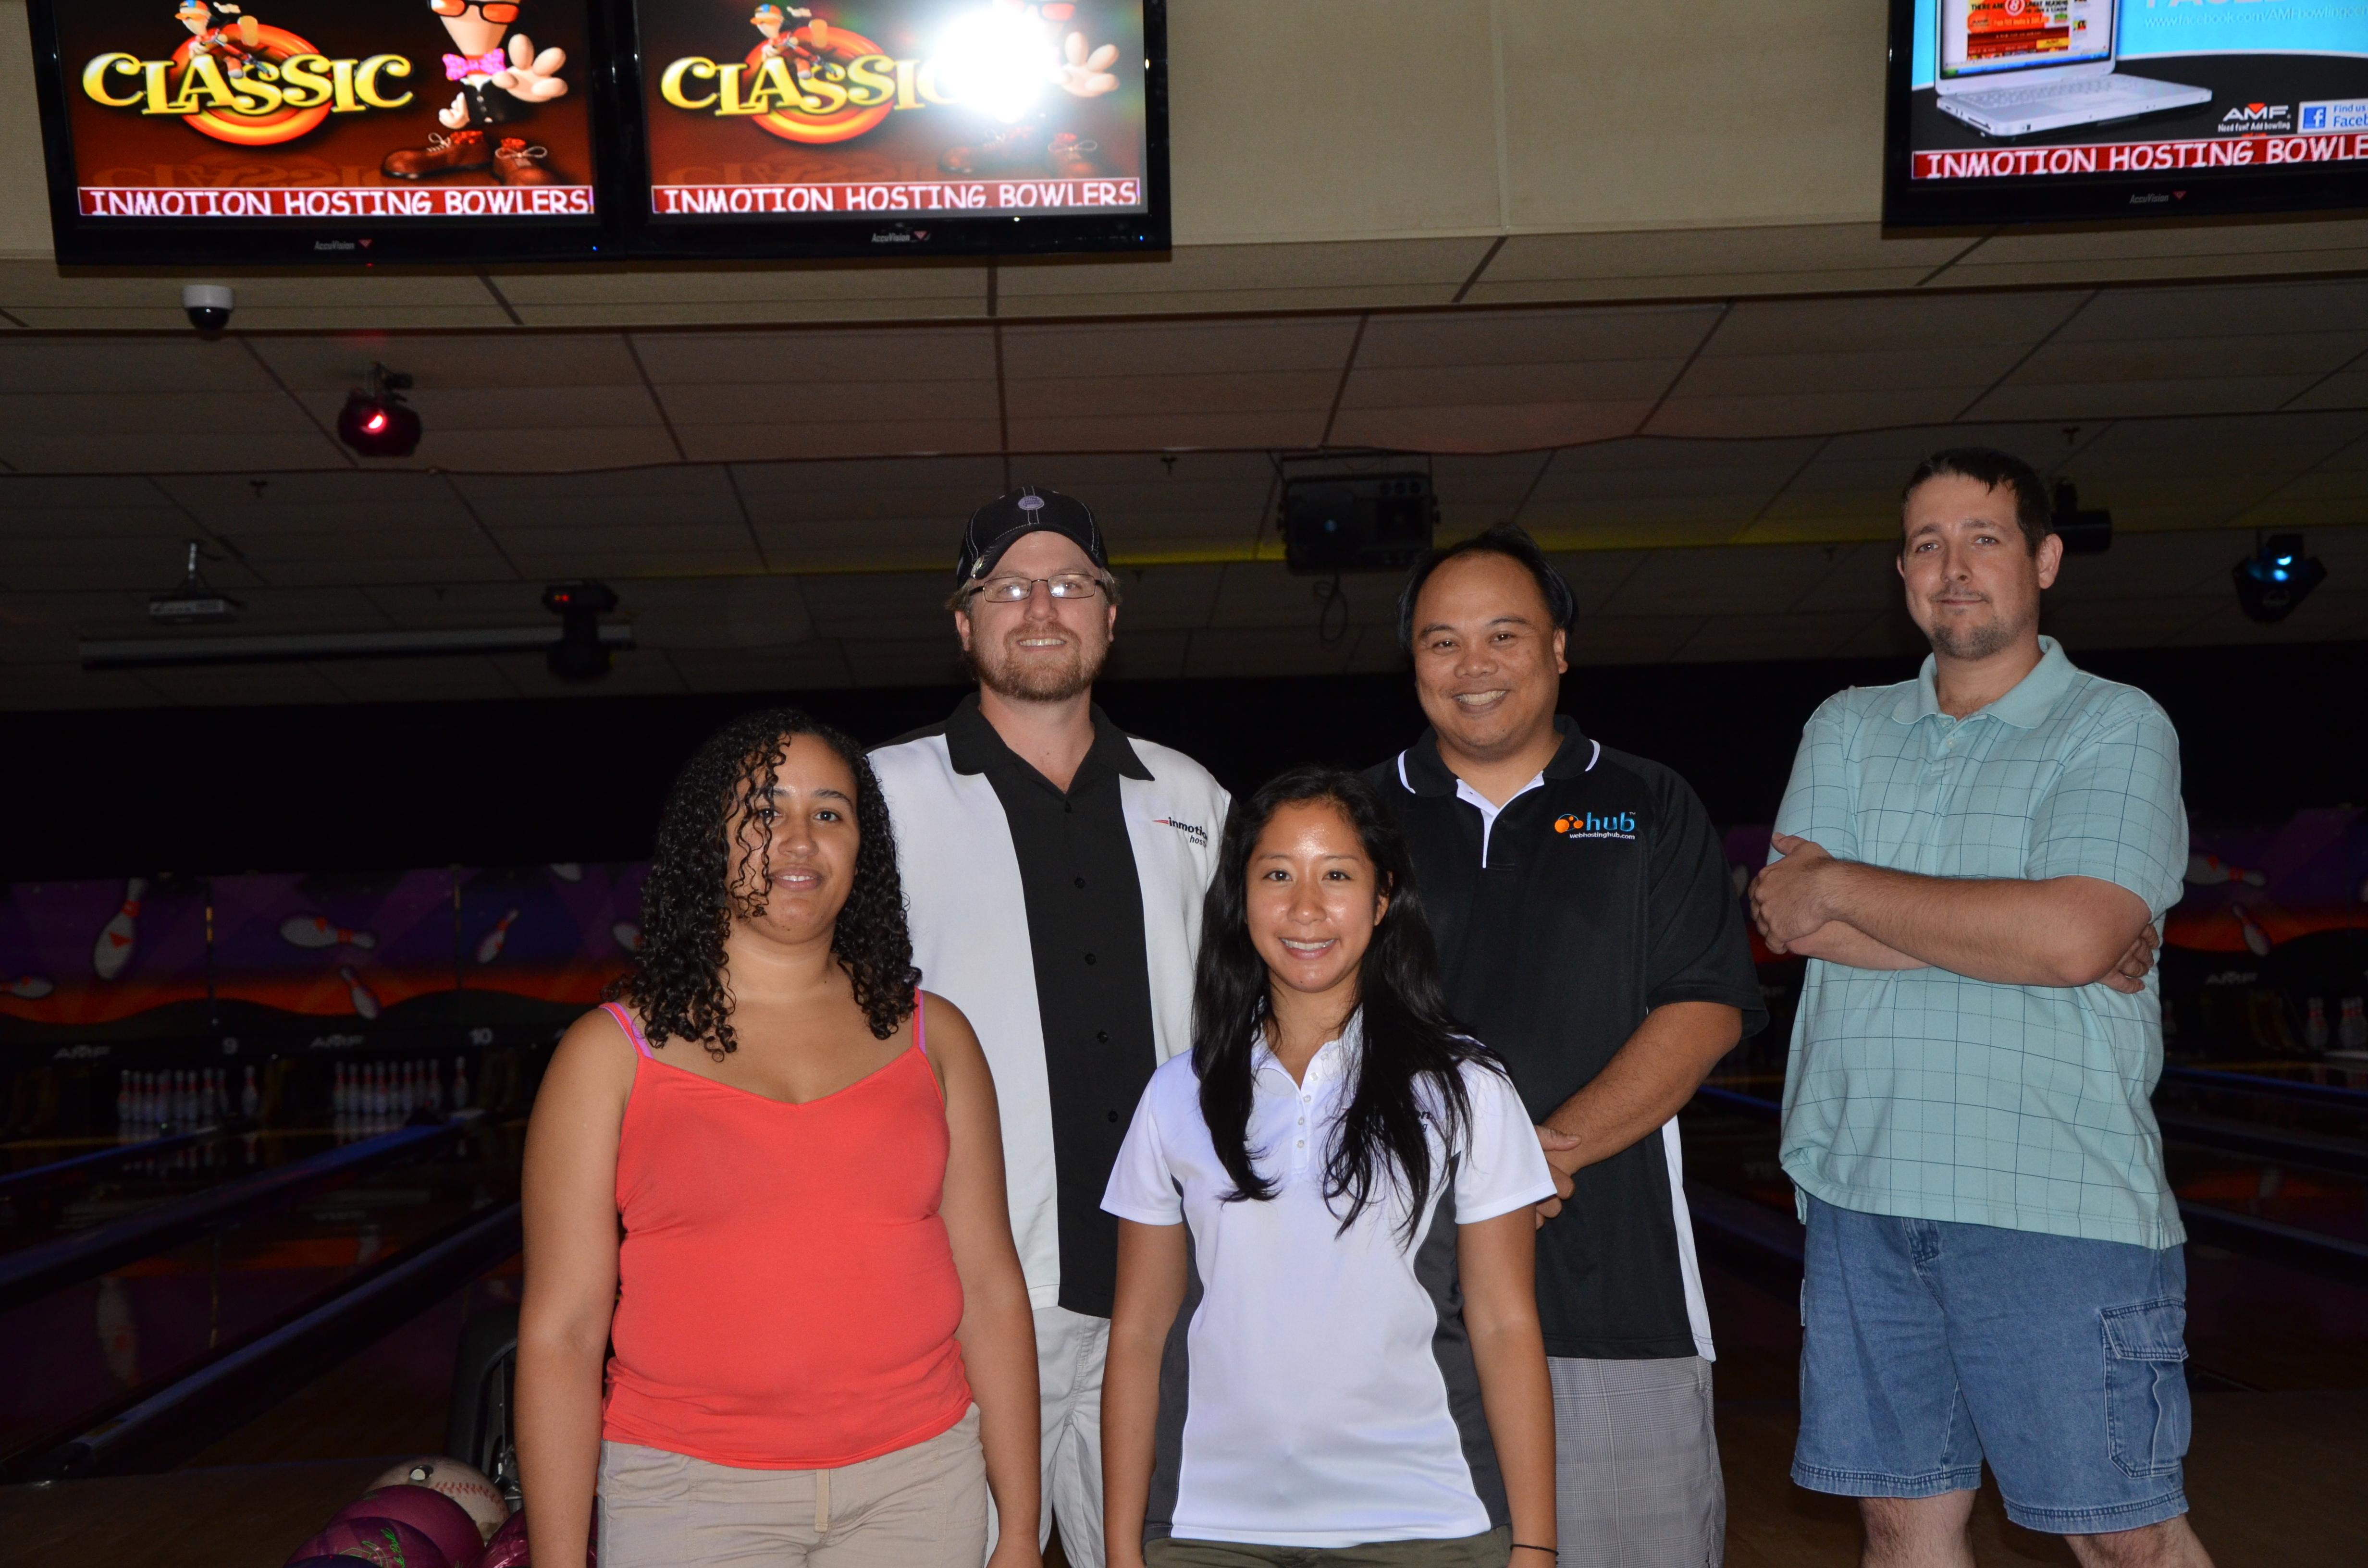 IMH Bowling Champions!